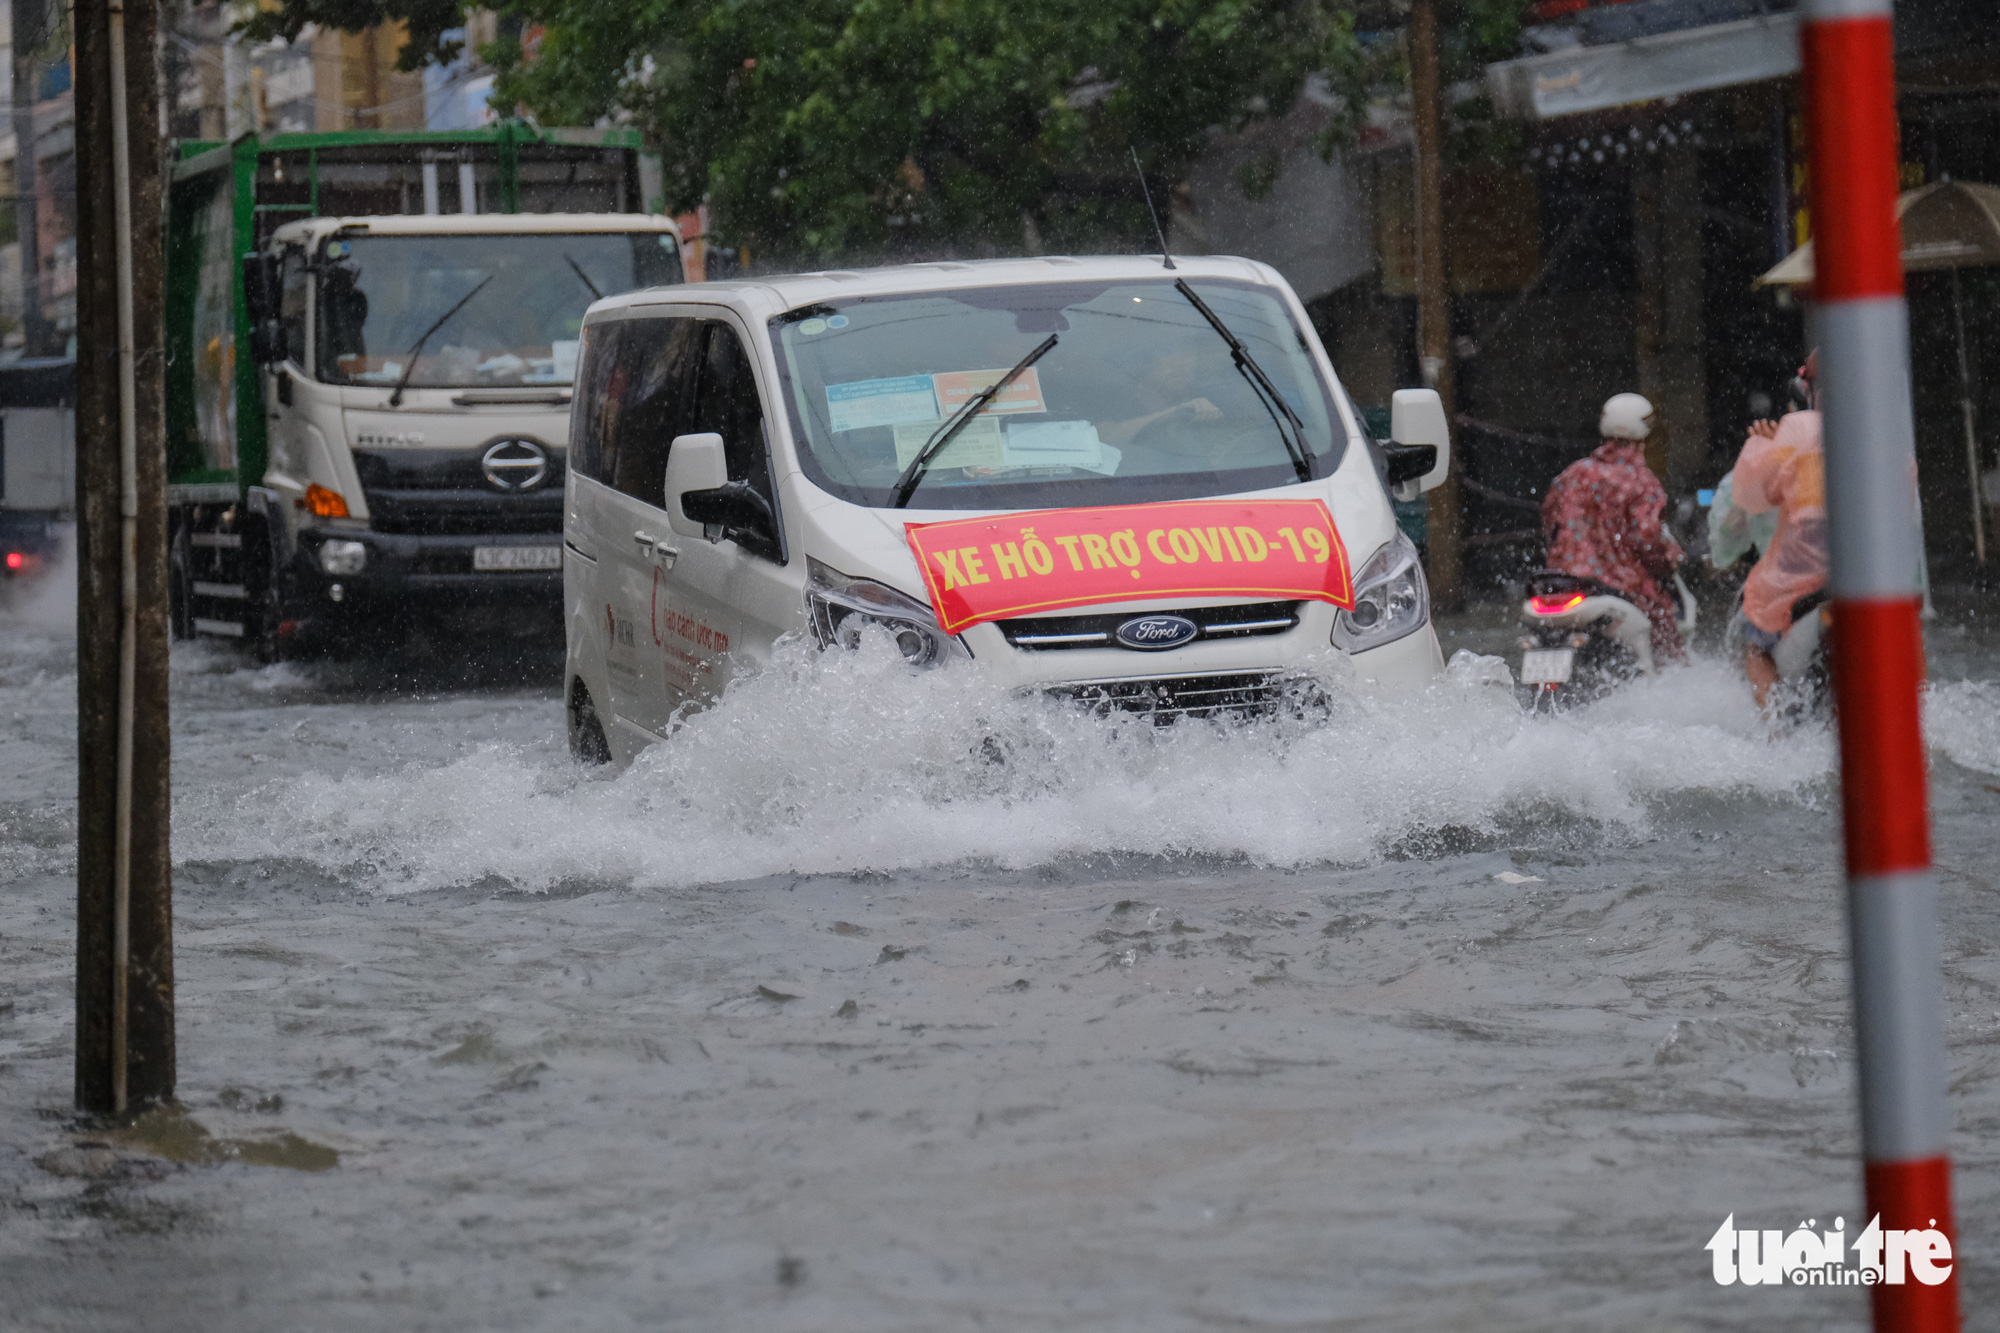 Vehicles wade through inundated rainwater on a street in Da Nang City, Vietnam, September 12, 2021. Photo: Tan Luc / Tuoi Tre